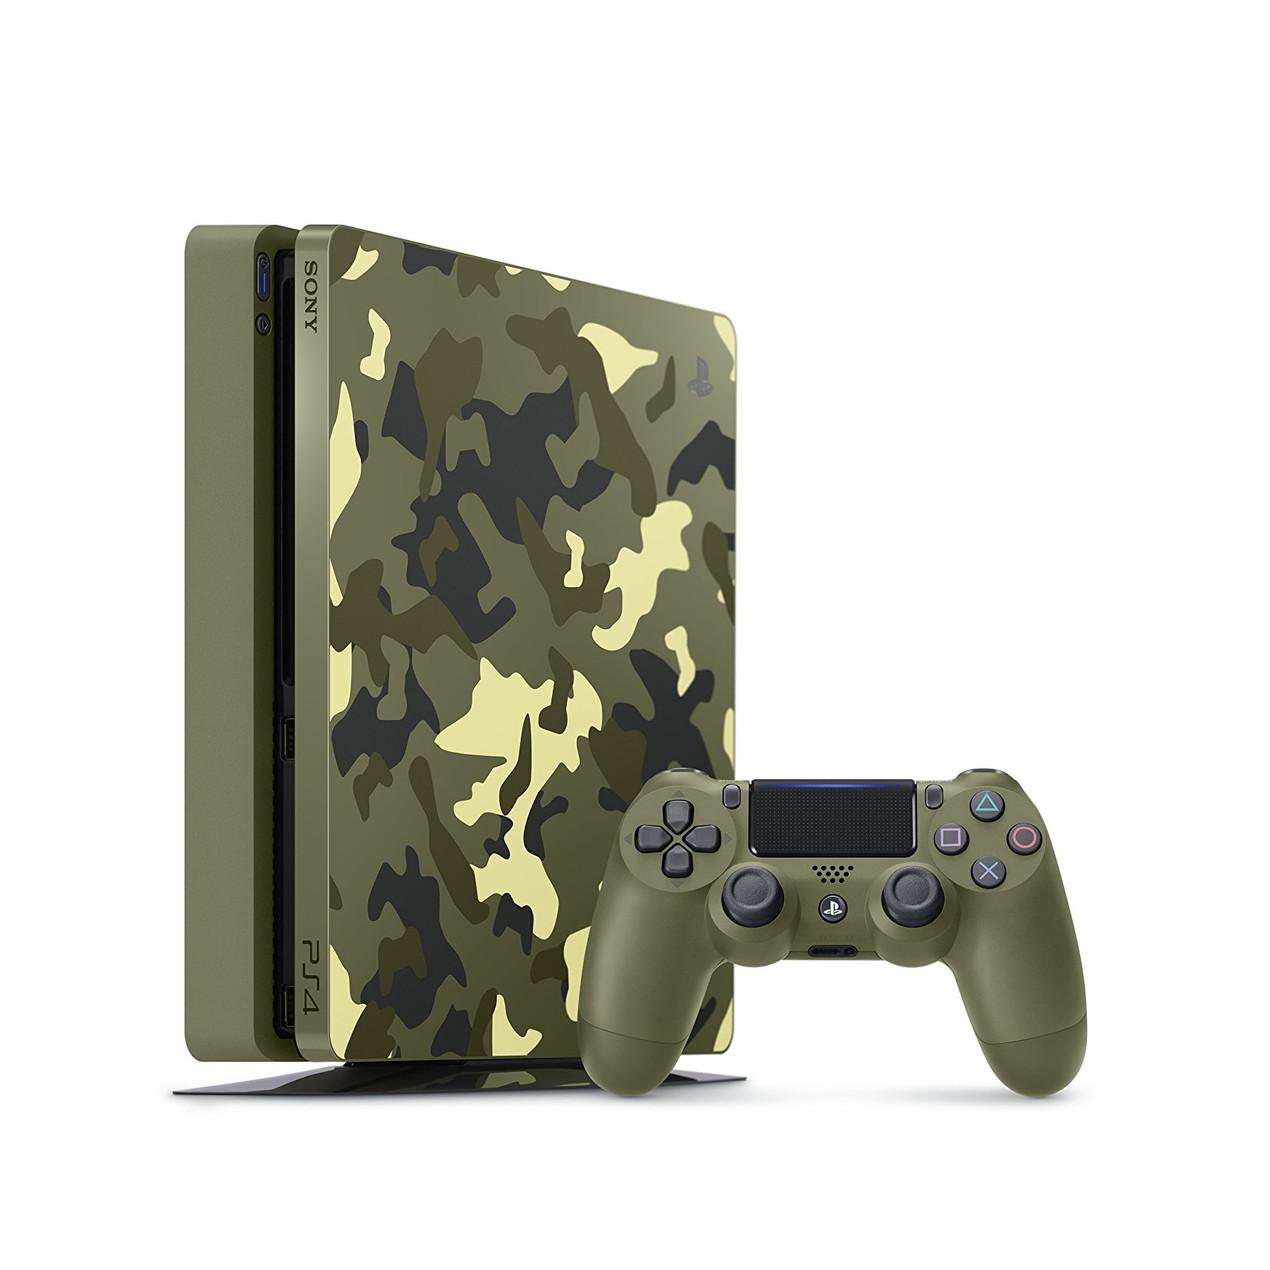 kiero.co | ps4 | consola ps4 | videojuegos